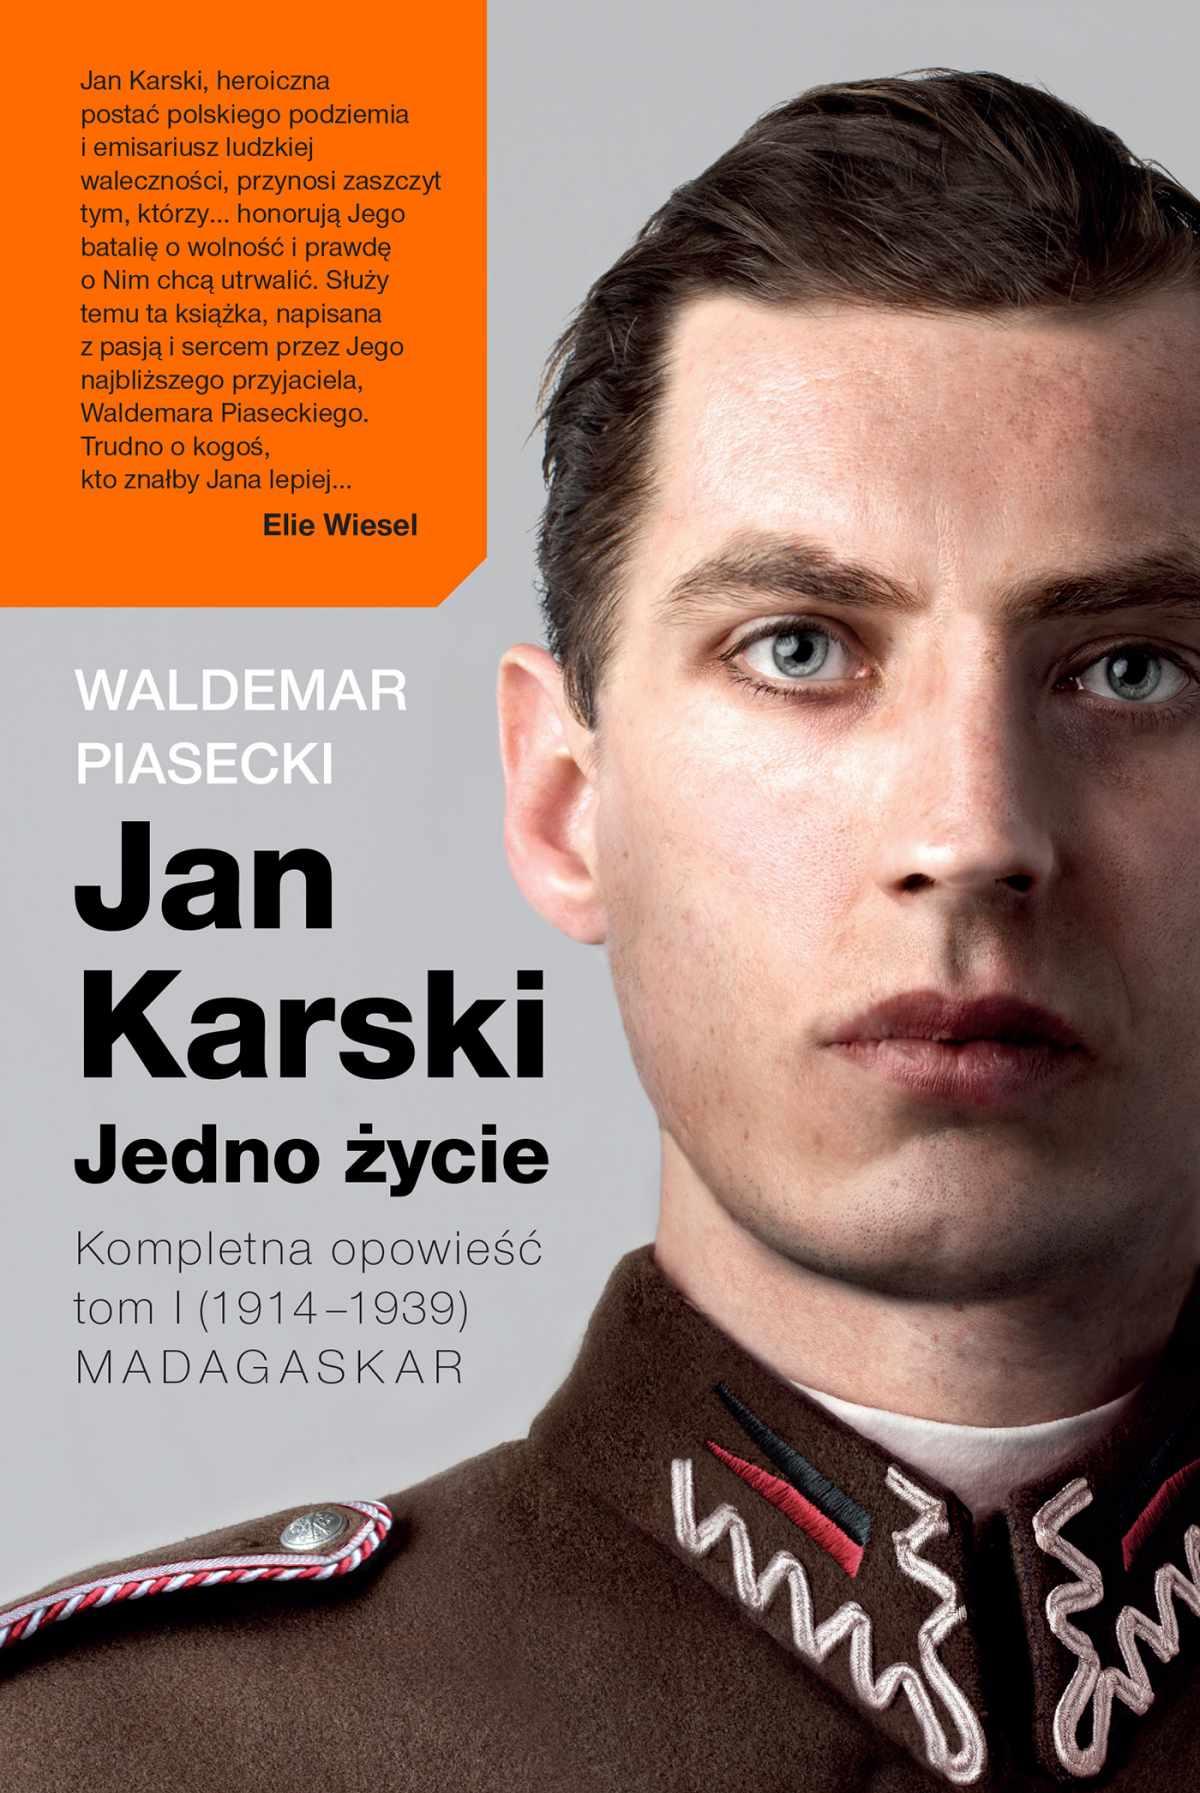 Jan Karski. Jedno życie. Tom 1. Madagaskar - Ebook (Książka na Kindle) do pobrania w formacie MOBI